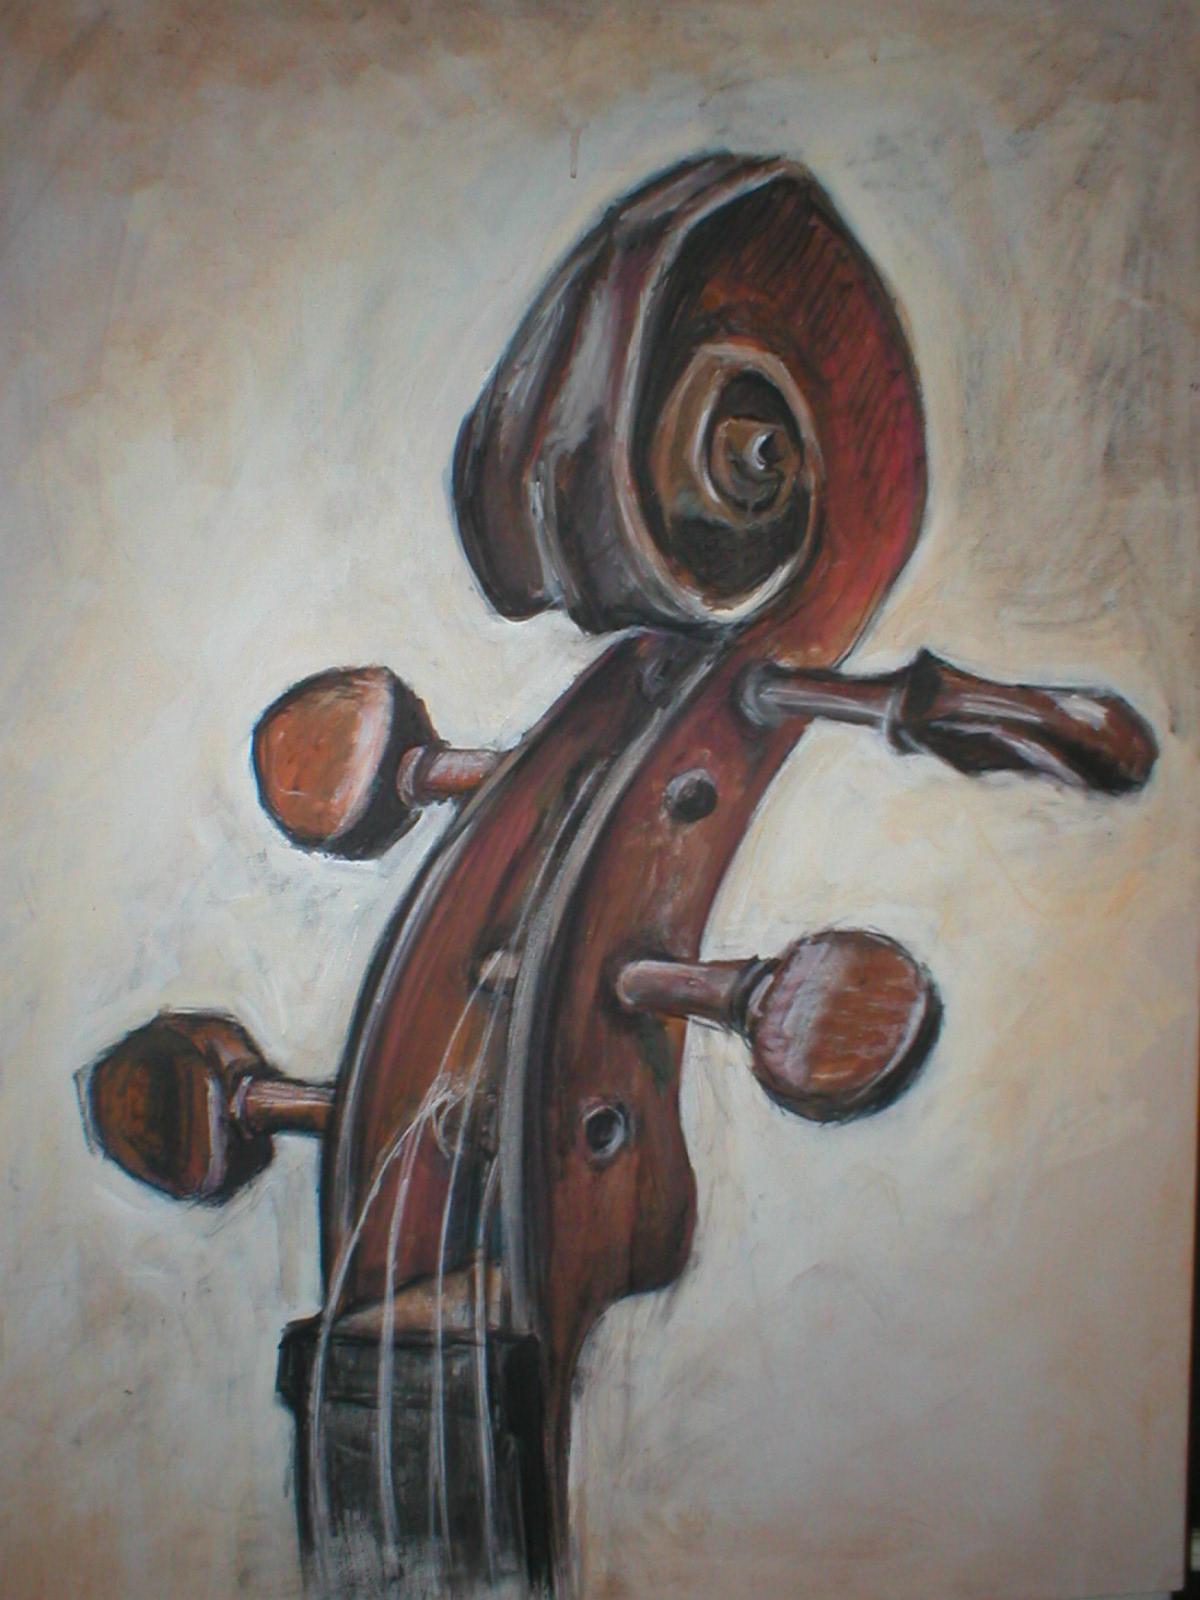 Drawn violinist simple Pinterest com/images/Art/Violin%20Head%20(drawing) jpg http://atelierantras ideas